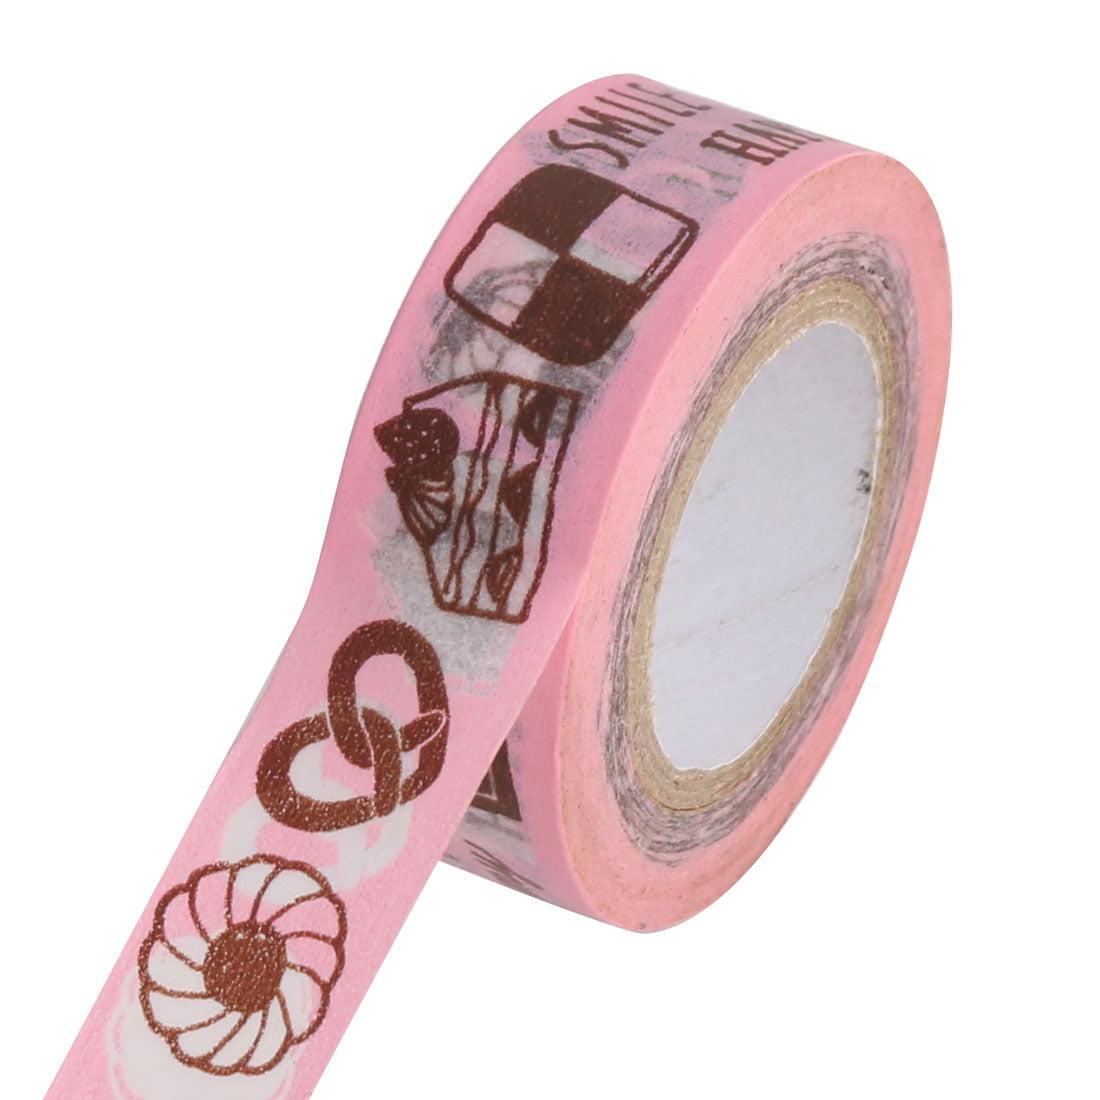 Dessert Pattern Scrapbooking DIY Craft Decorative Washi Masking Tape Roll